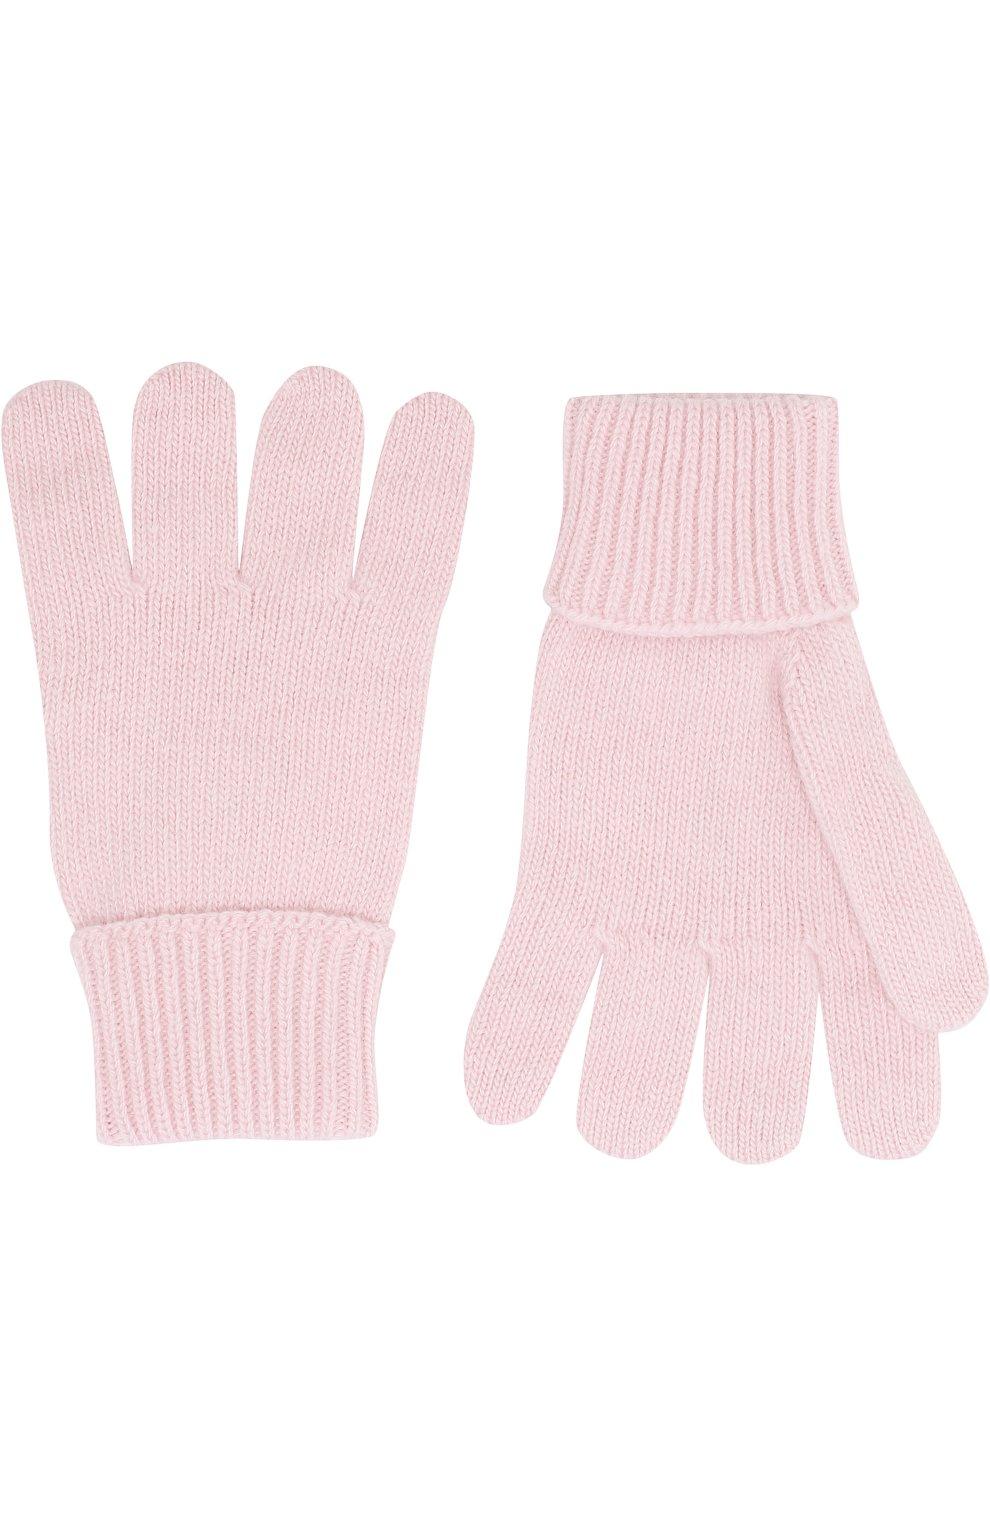 Детские перчатки из смеси шерсти и кашемира IL TRENINO светло-розового цвета, арт. 17 5139/E0 | Фото 2